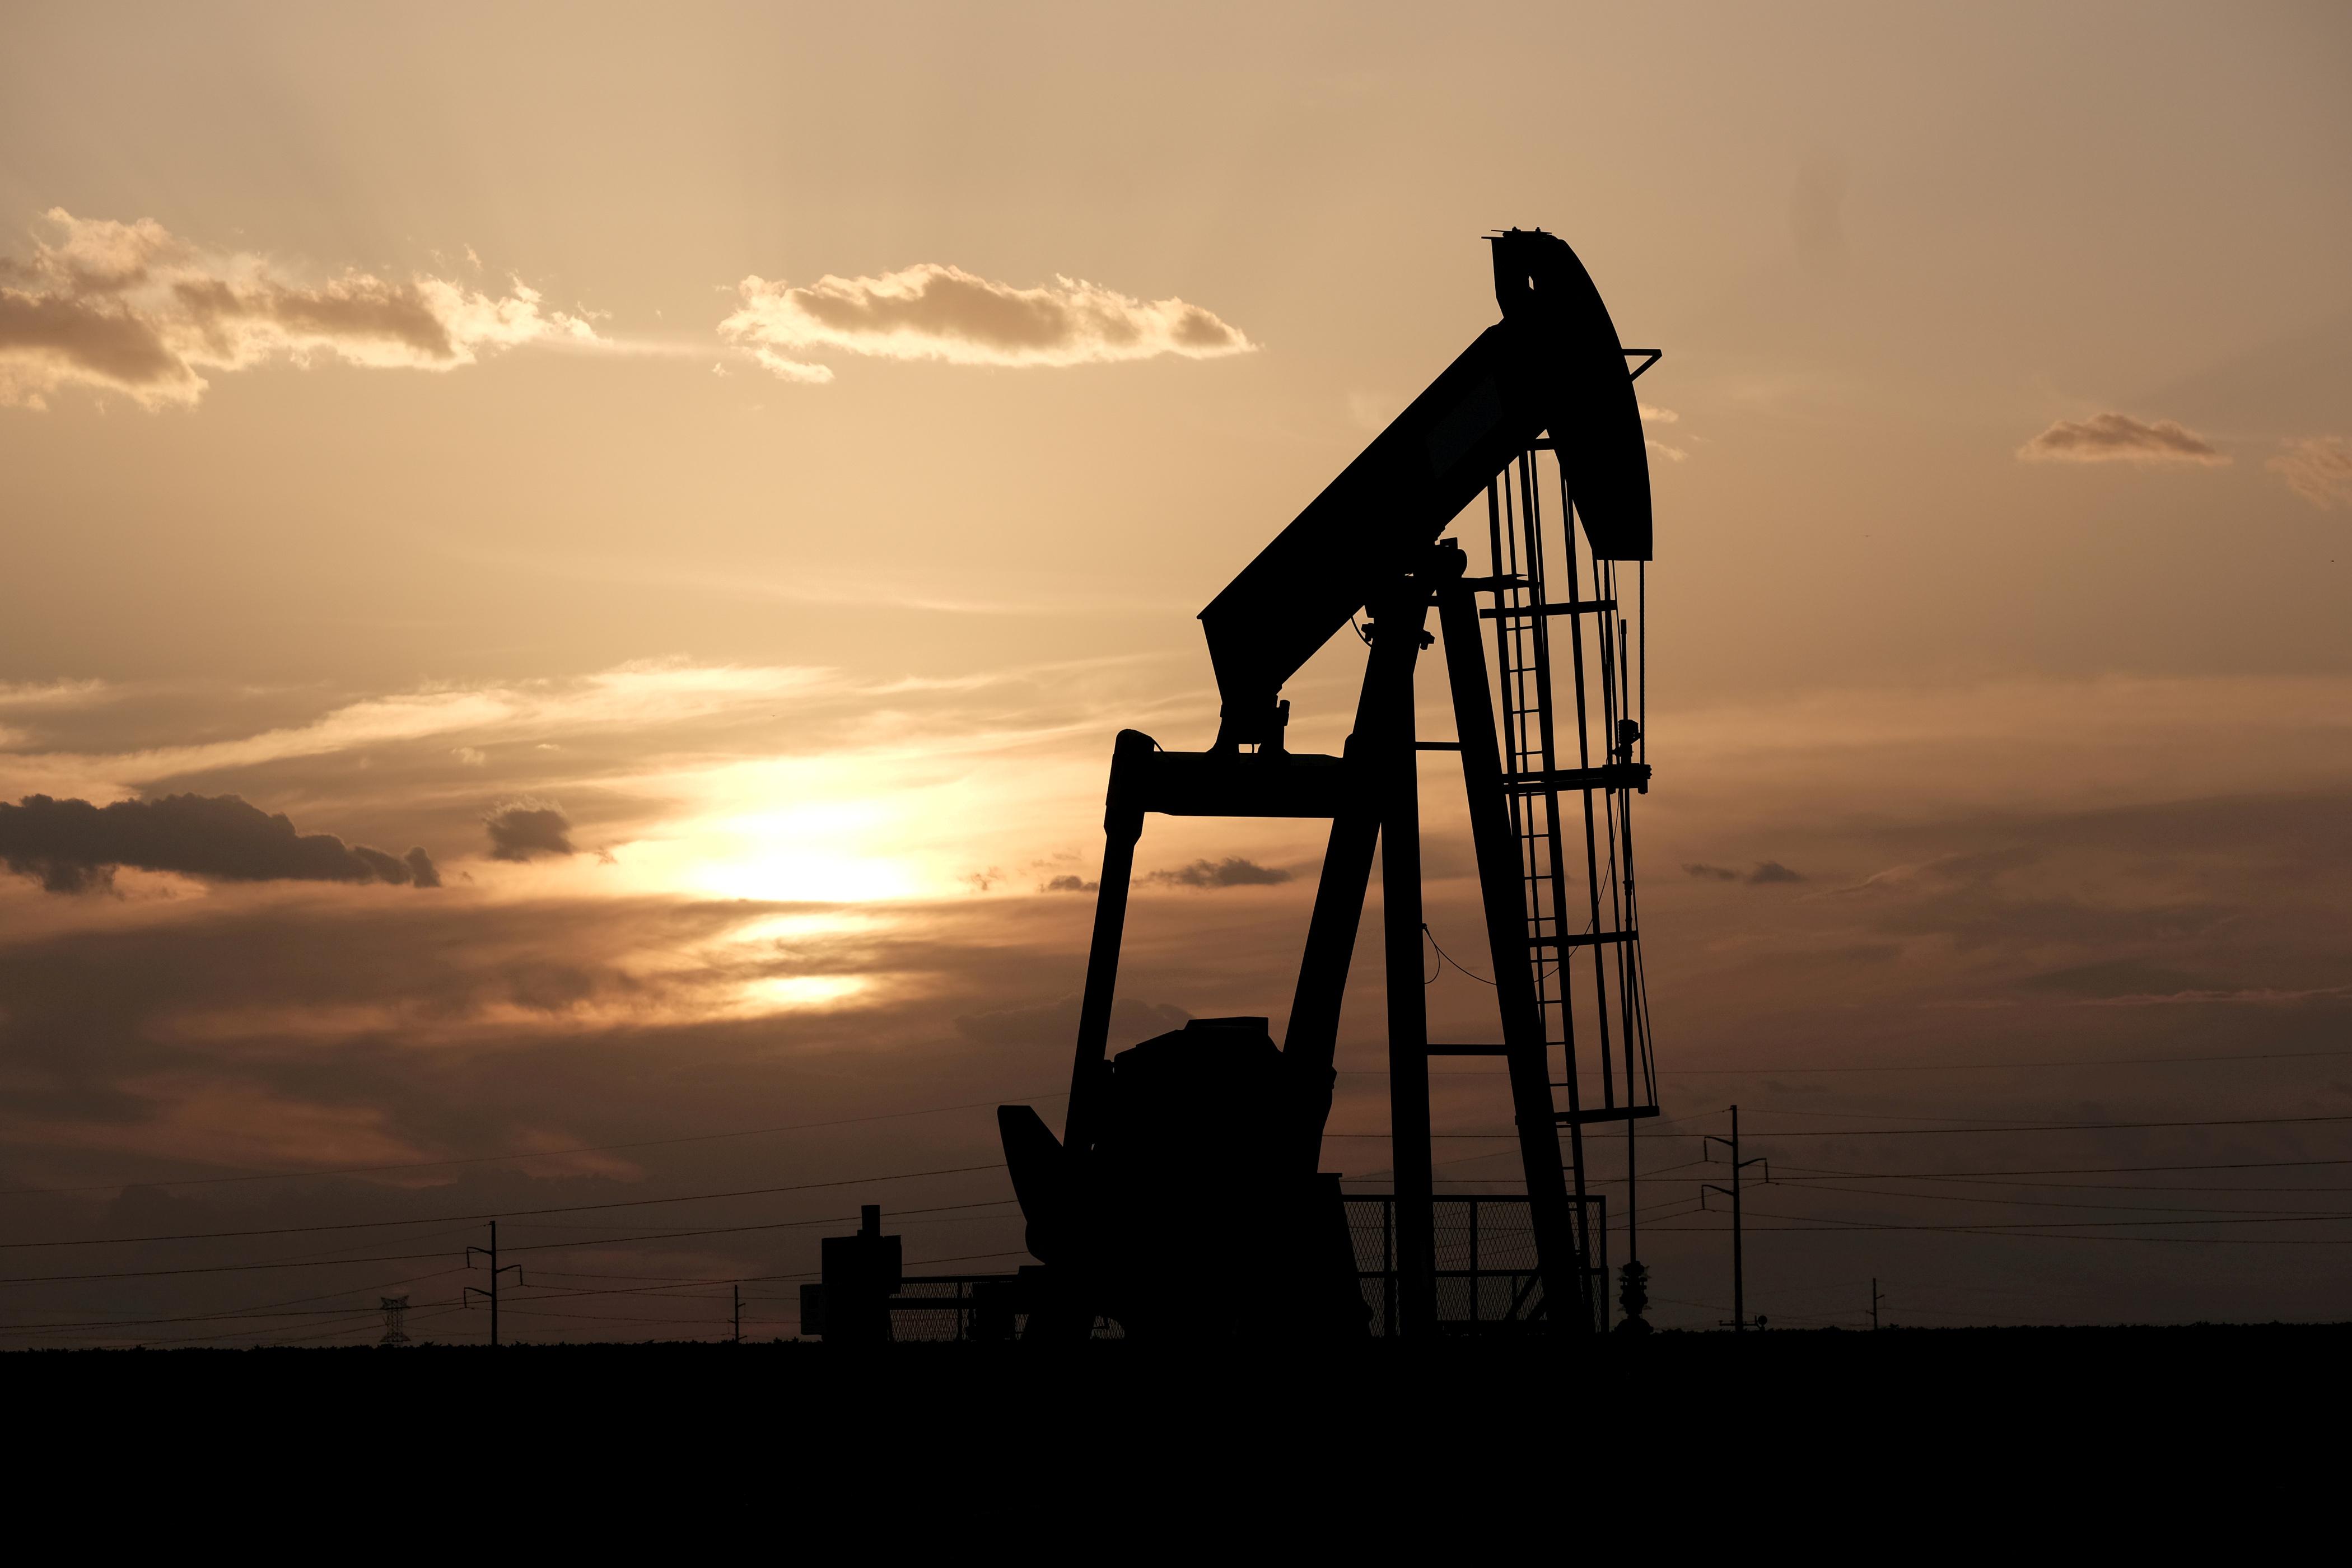 Oil pump jacks work at sunset near Midland, Texas, U.S., August 21, 2019. REUTERS/Jessica Lutz/File Photo